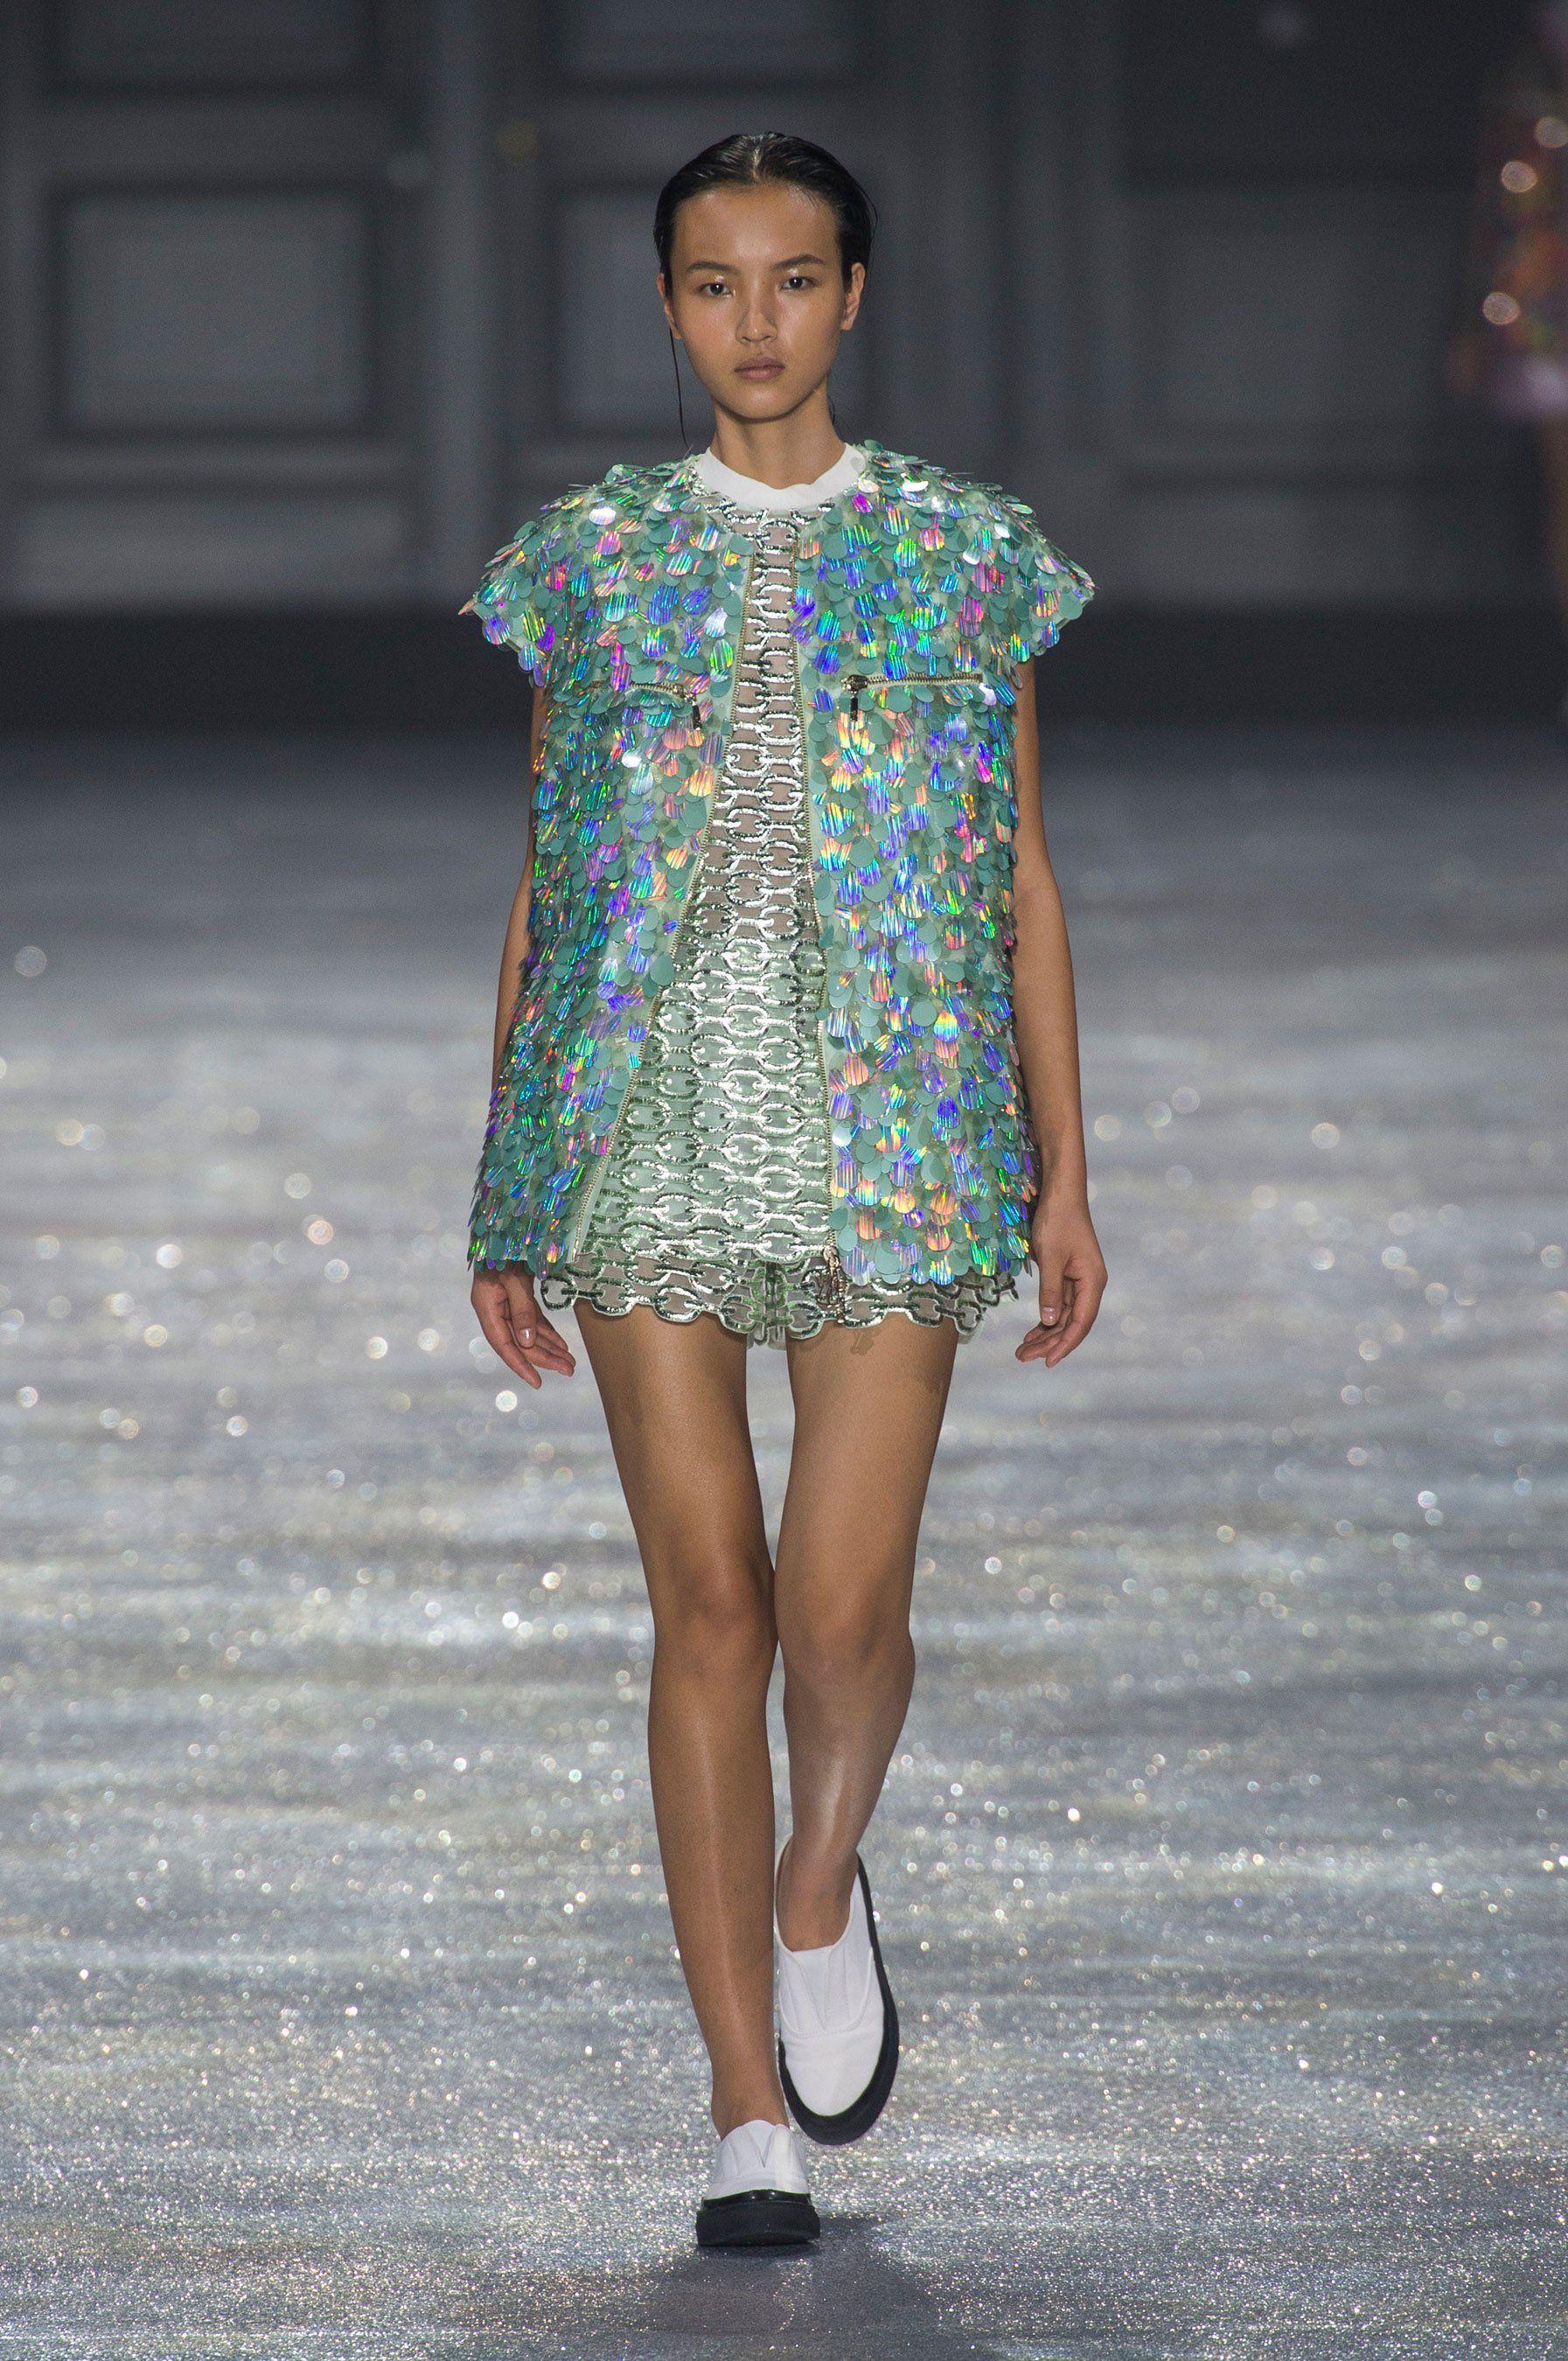 Moncler Gamme Rouge S/S '15 Fashion, Fashion week, Paris